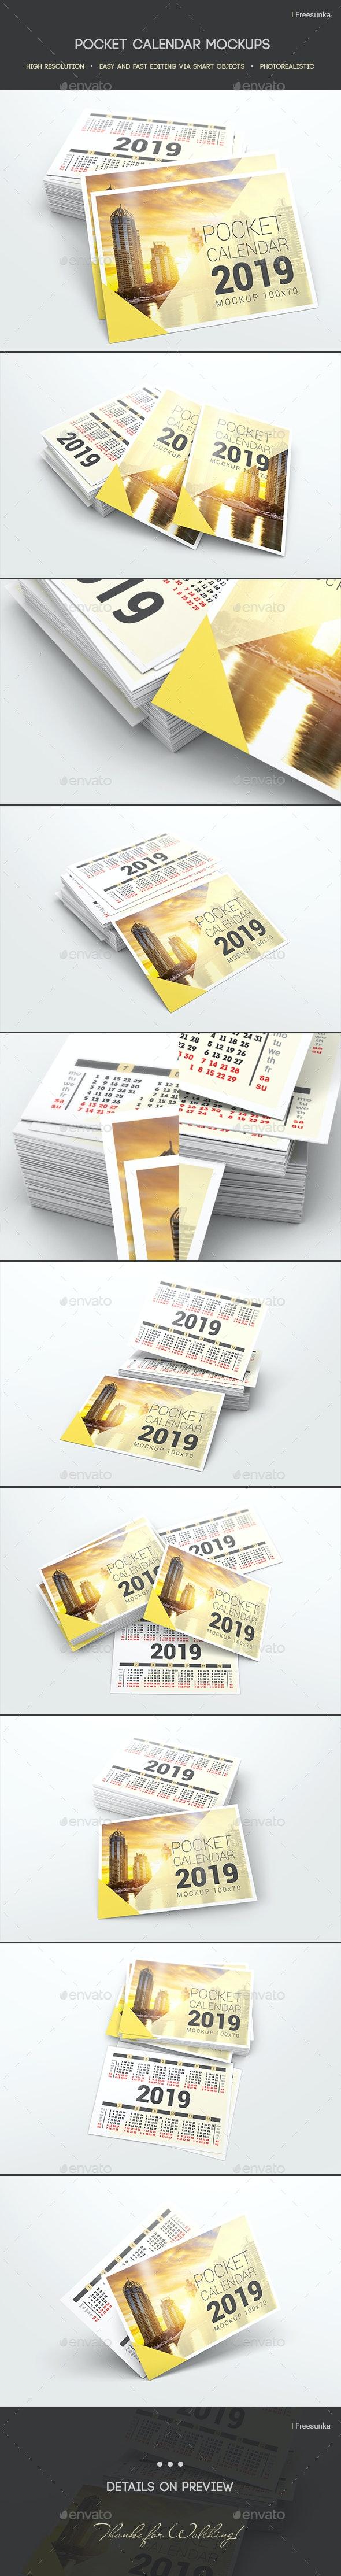 Pocket Calendar Mockups - Miscellaneous Print